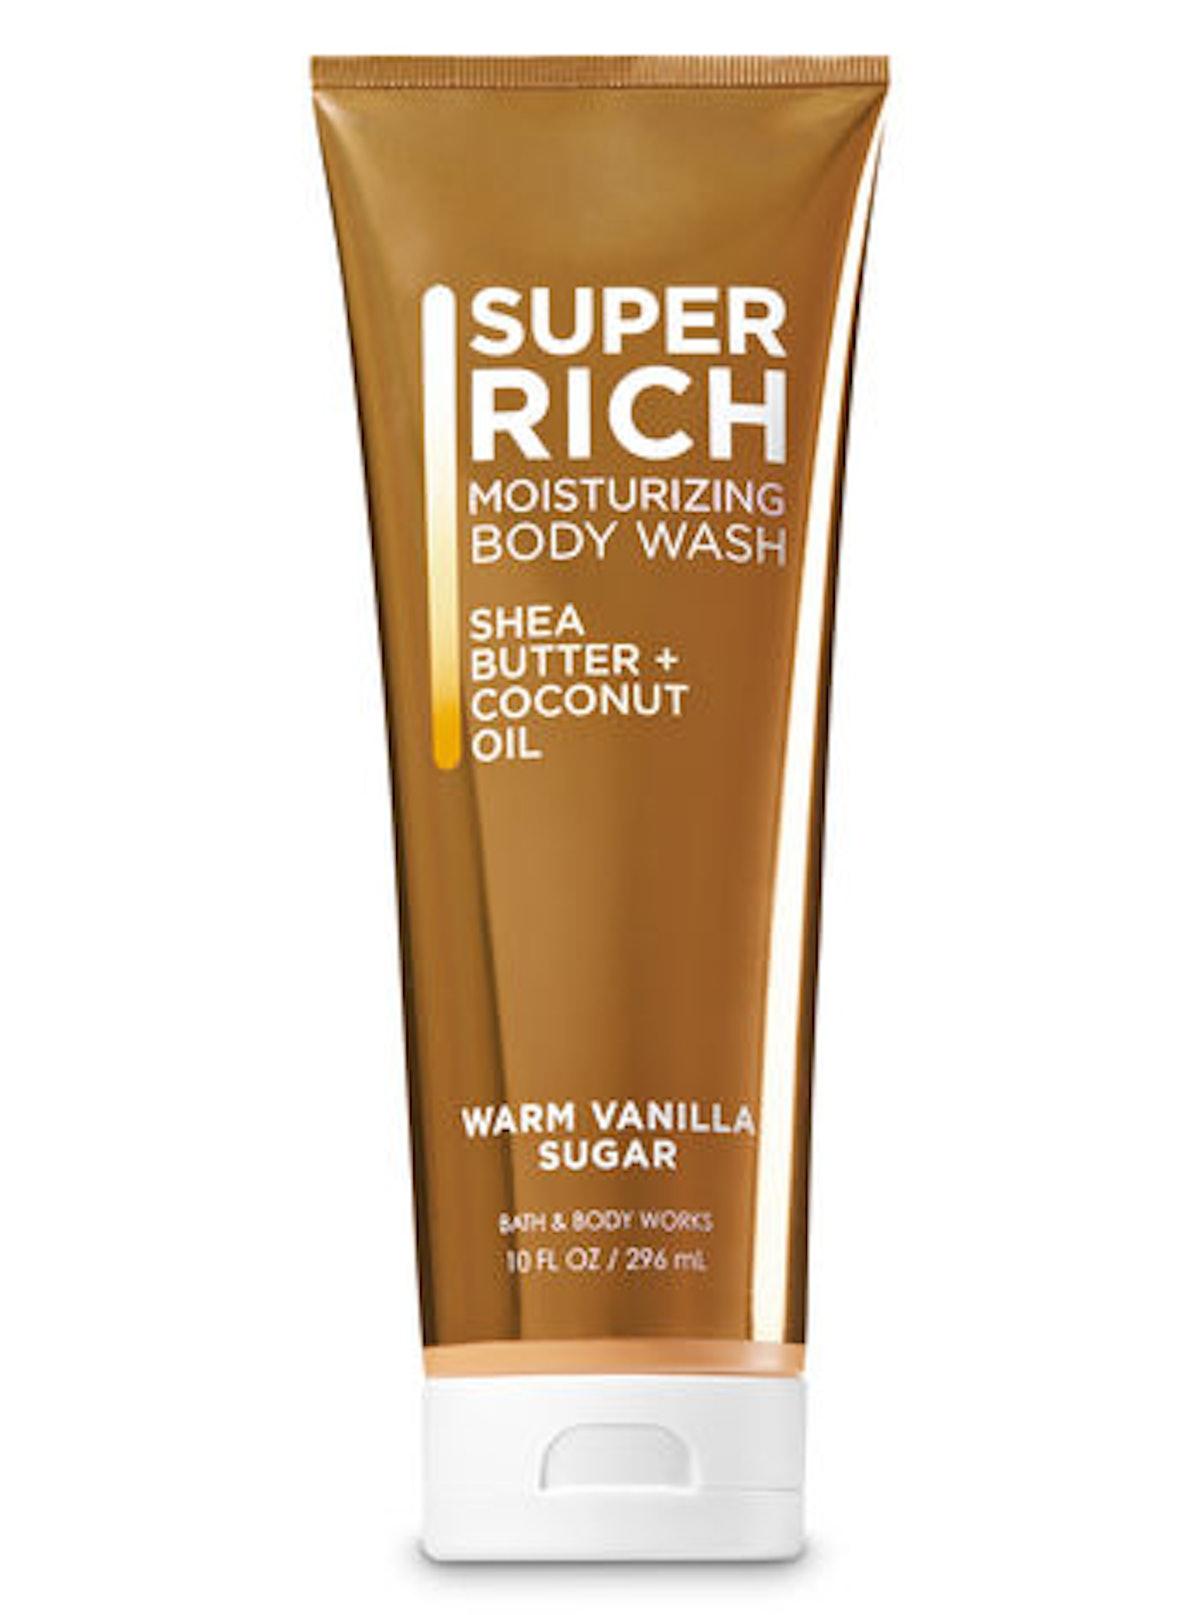 Warm Vanilla Sugar Moisturizing Body Wash